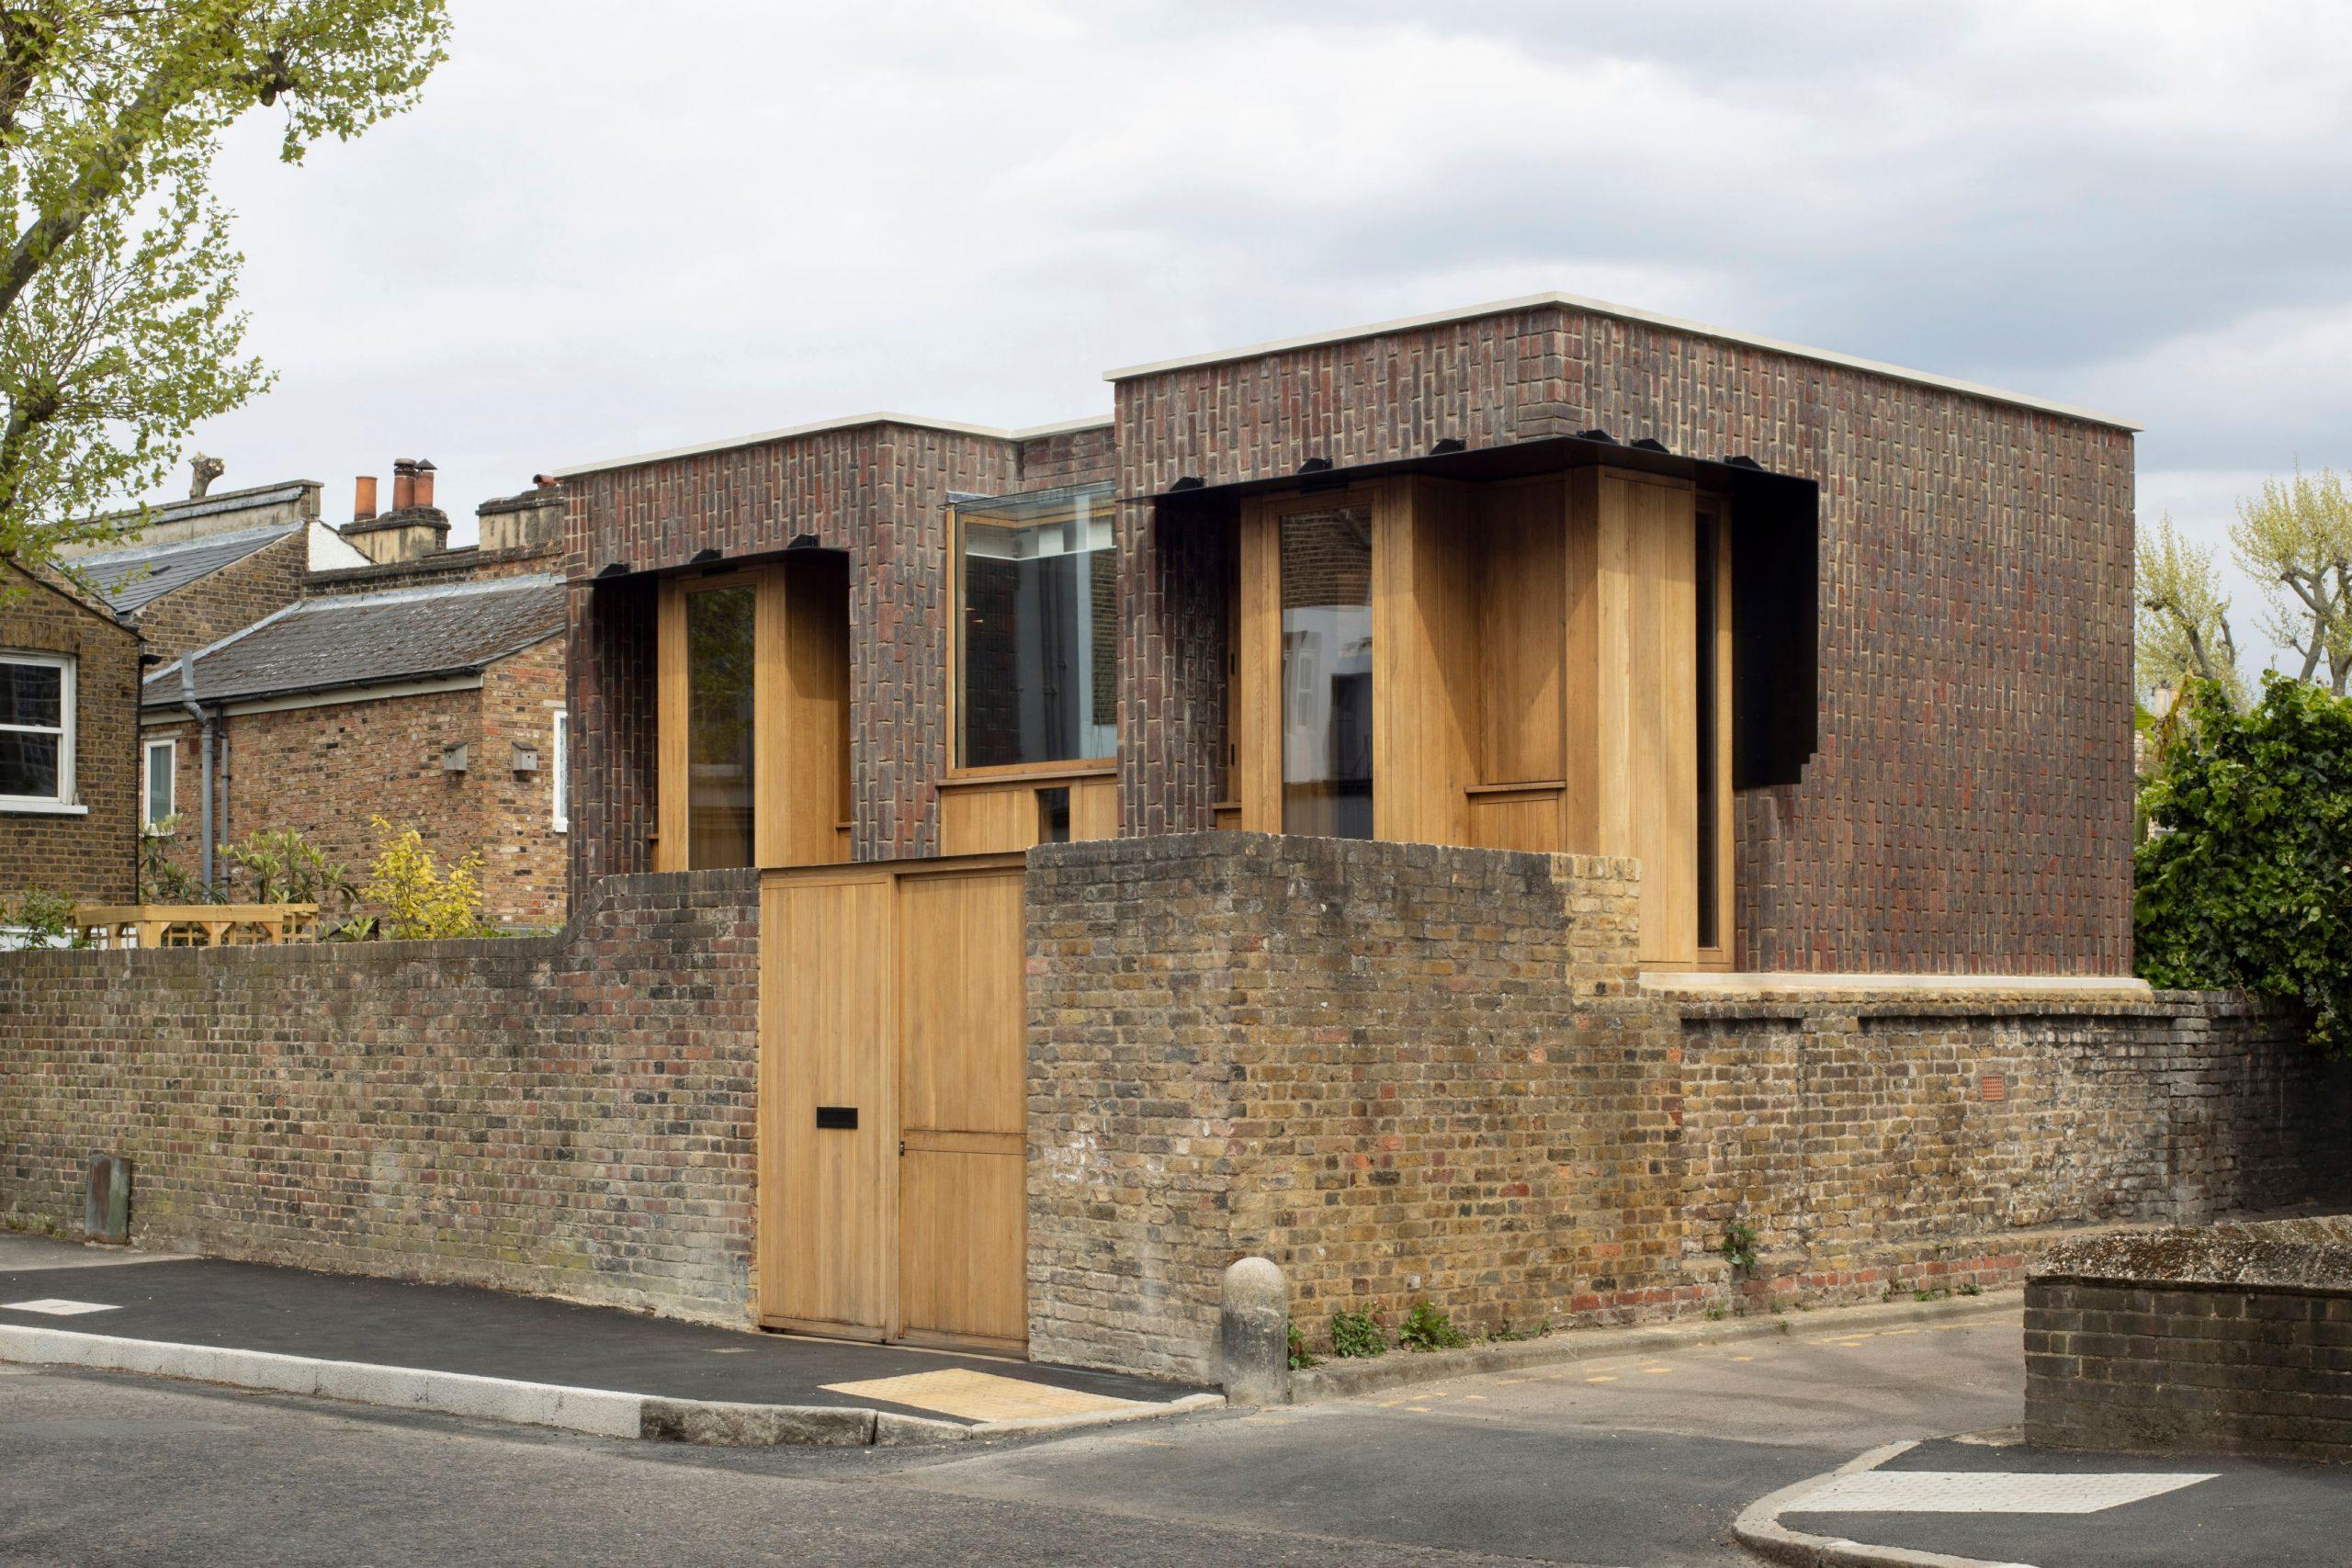 Brick_house3